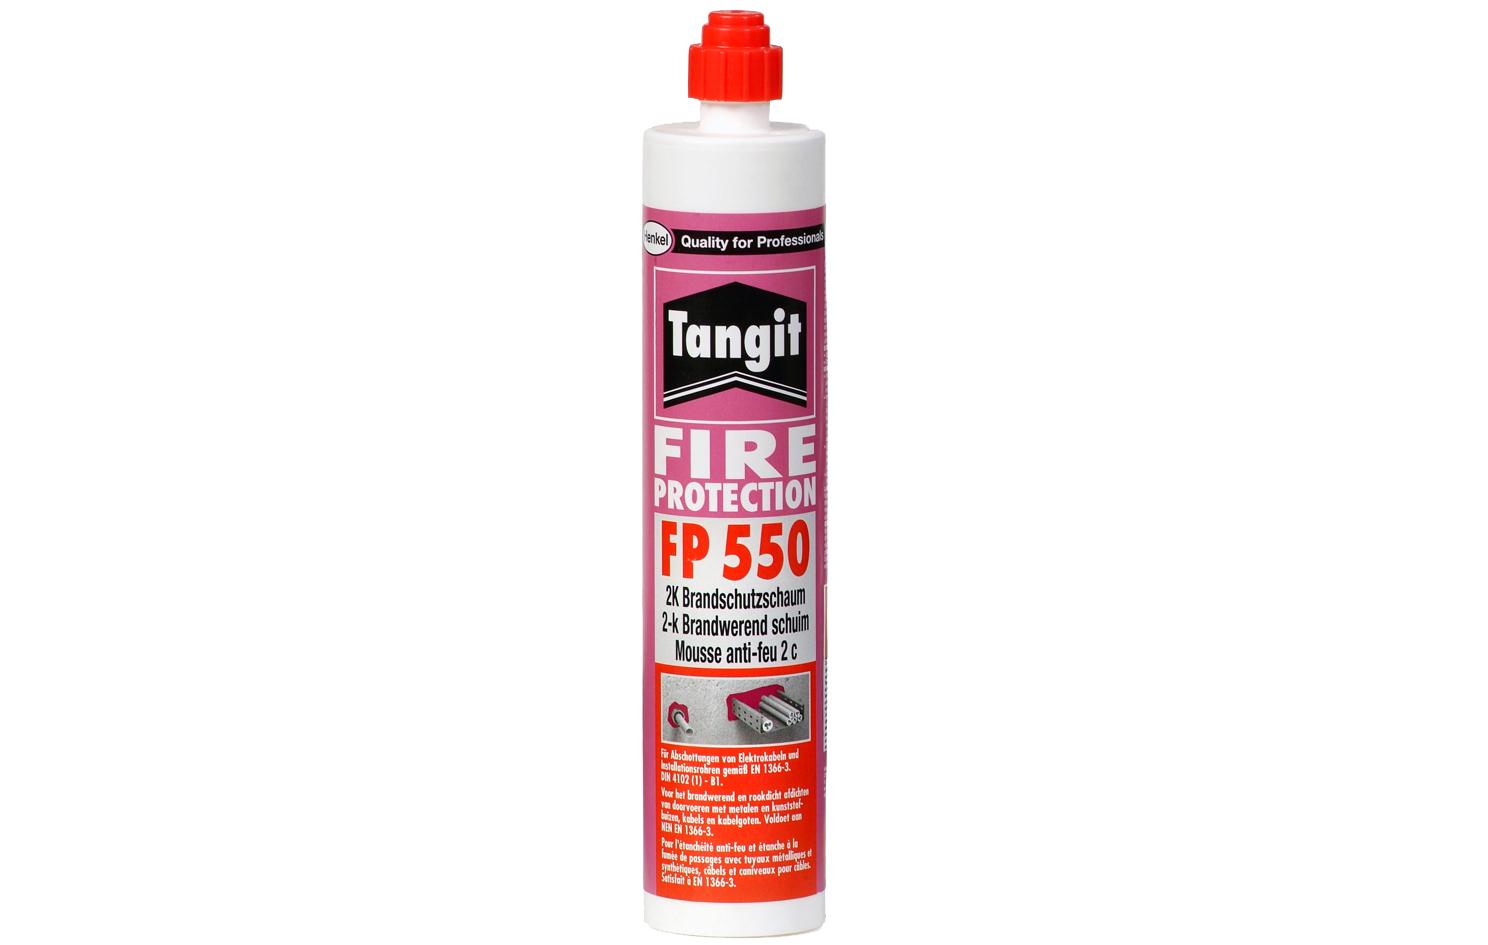 Tangit_FP_550_2181550.jpg